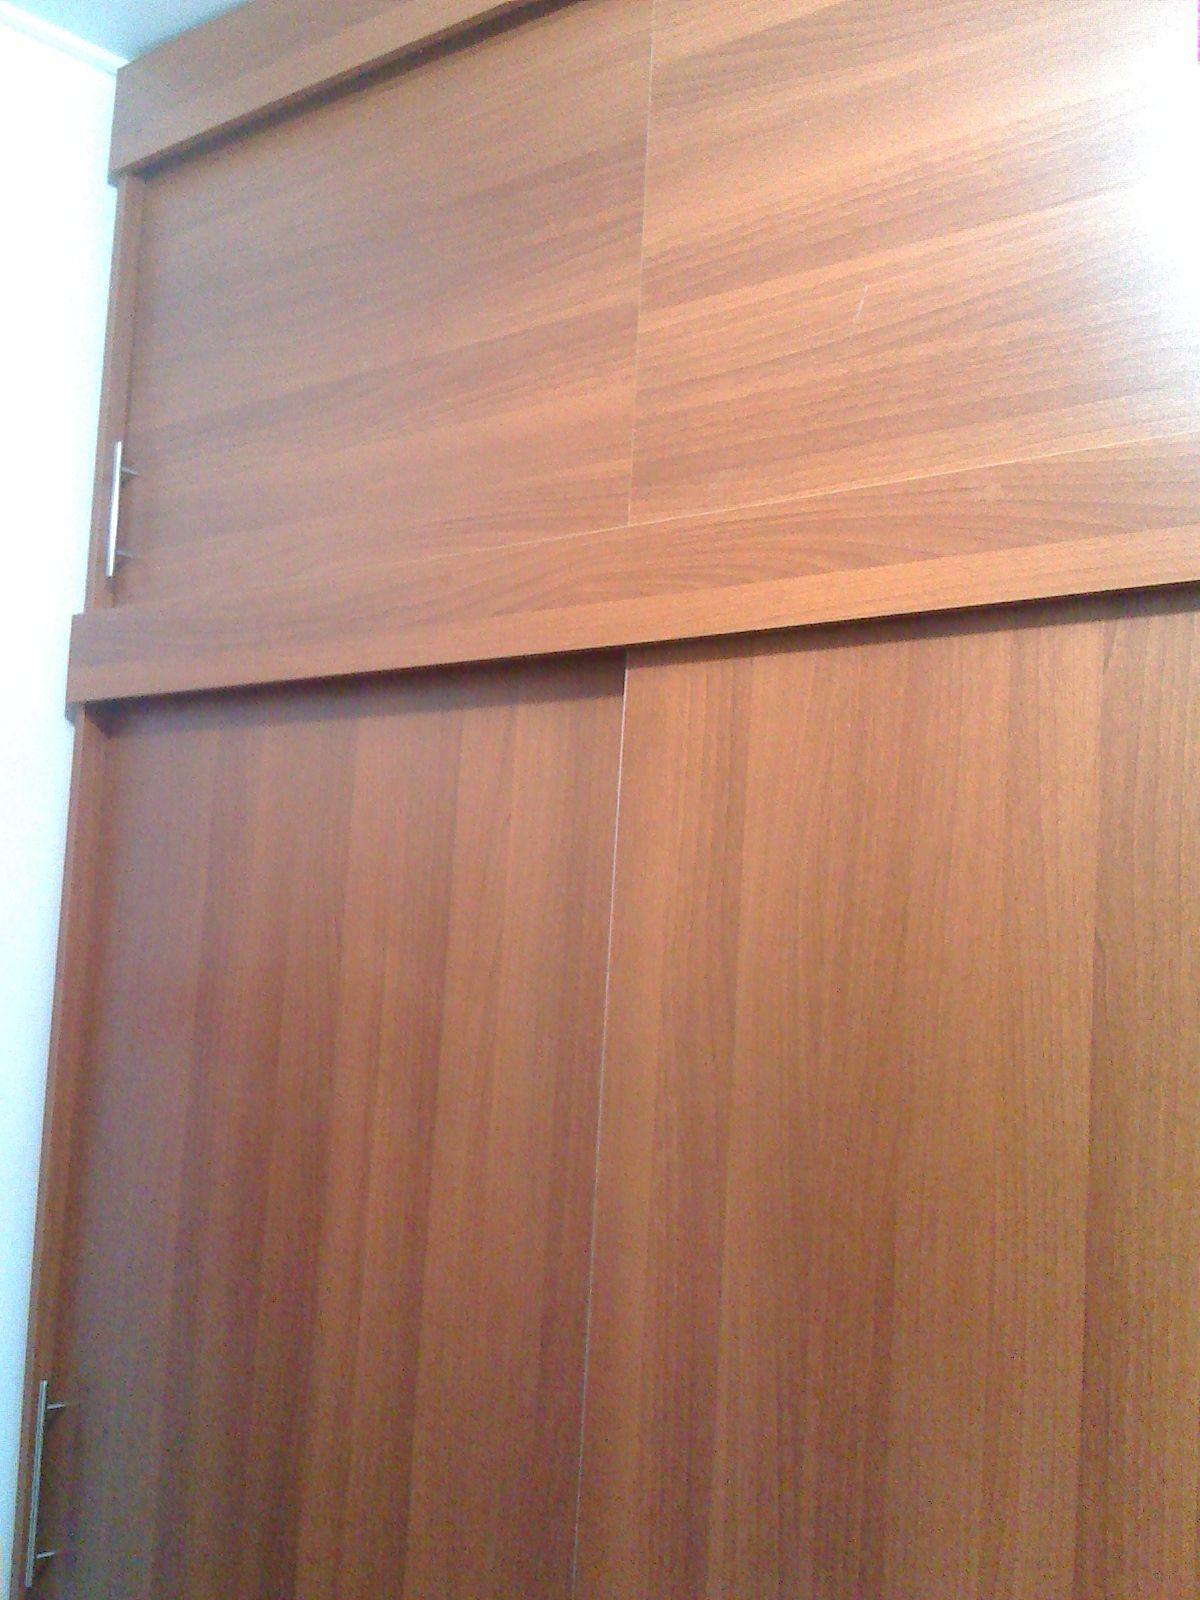 Closet puertas corredizas 2 closets pinterest for Agarraderas para puertas de vidrio